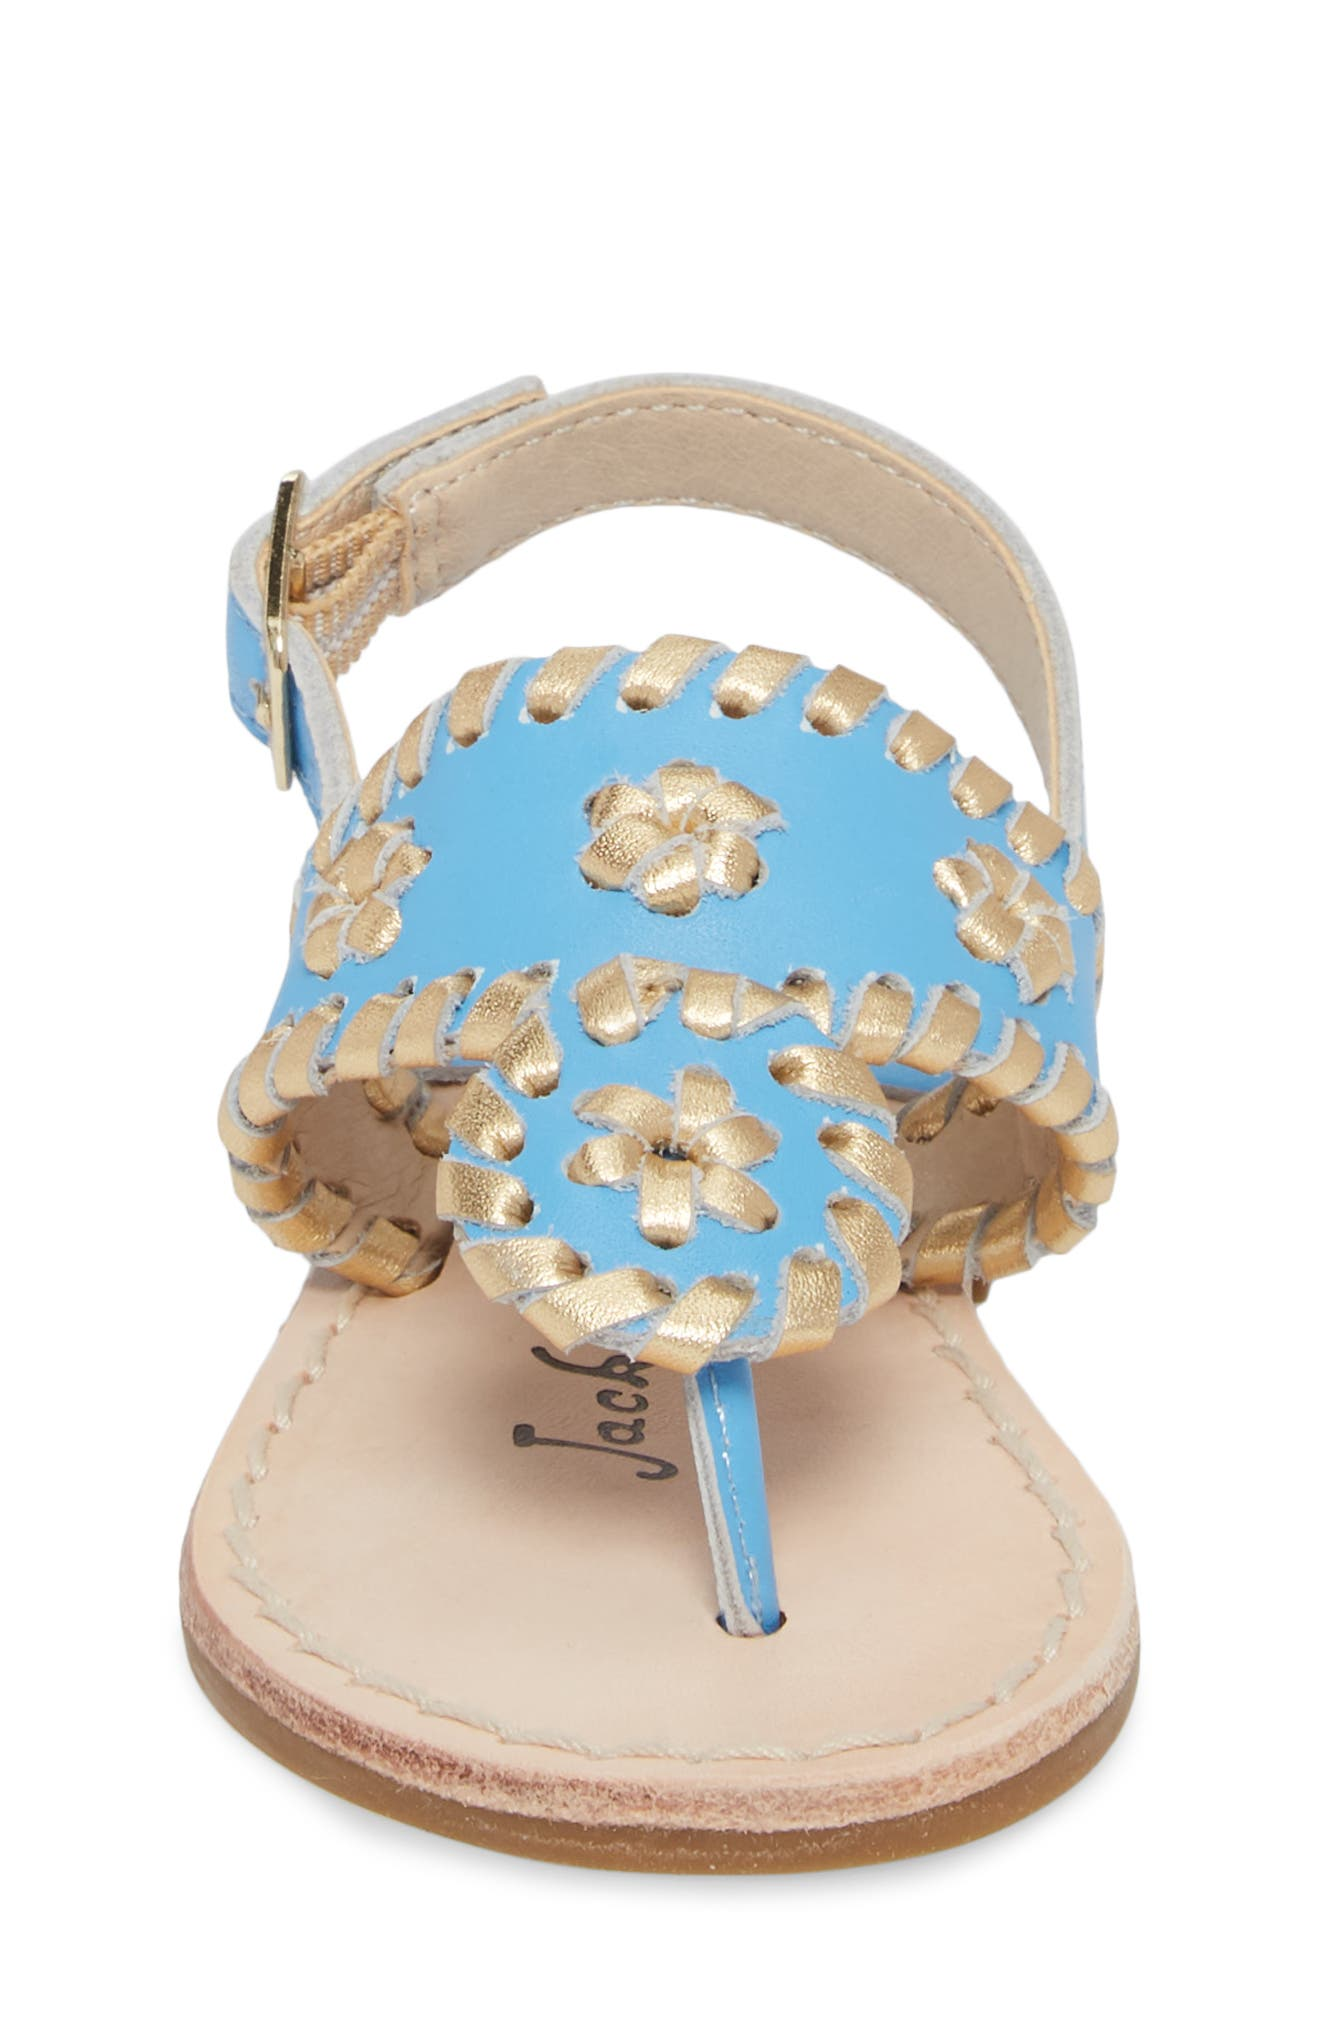 Little Miss Hollis Metallic Trim Sandal,                             Alternate thumbnail 4, color,                             FRENCH BLUE/ GOLD LEATHER